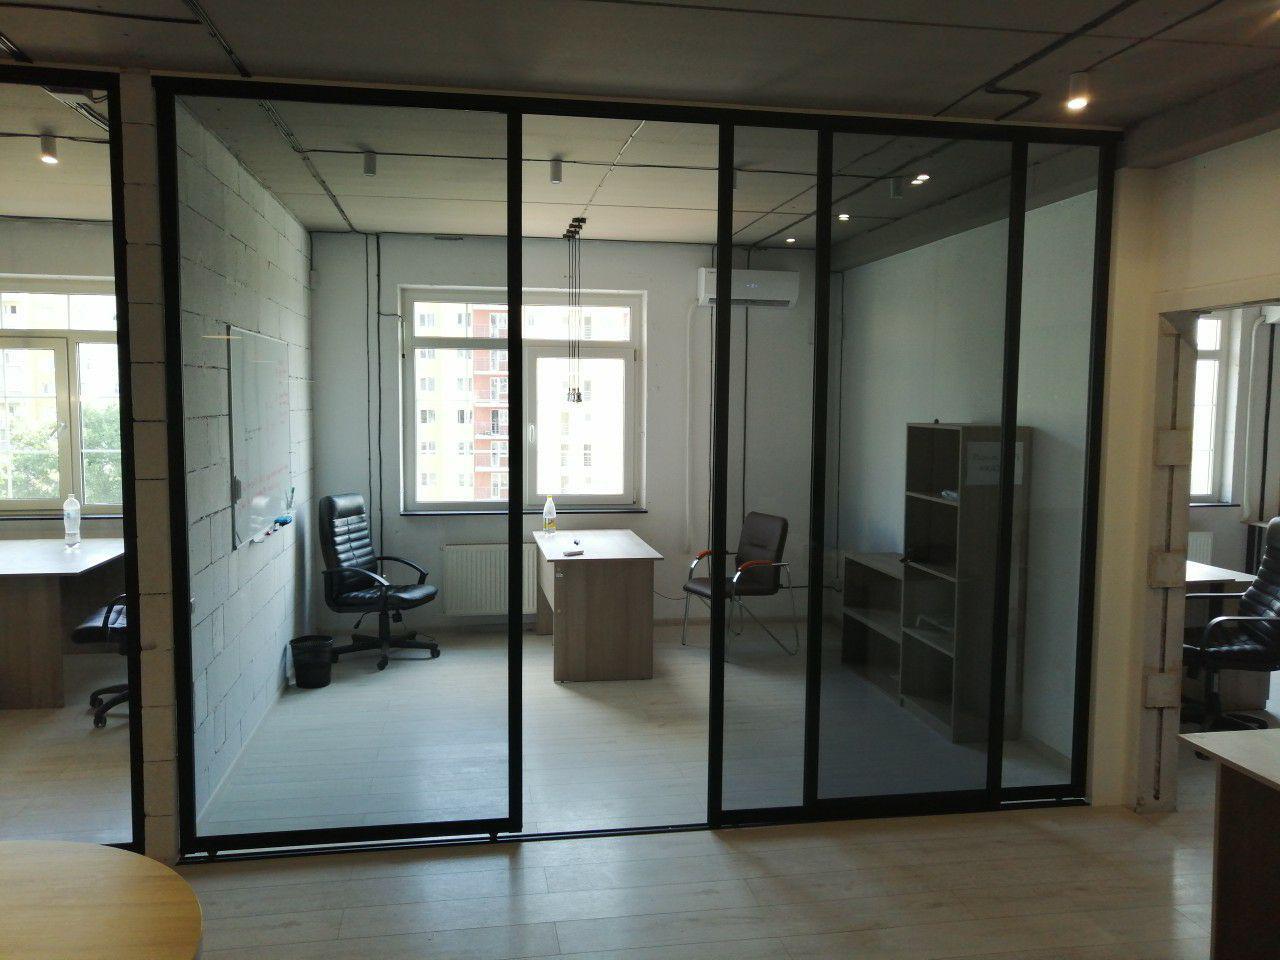 remont-ofisa-peregorodka-200619-3